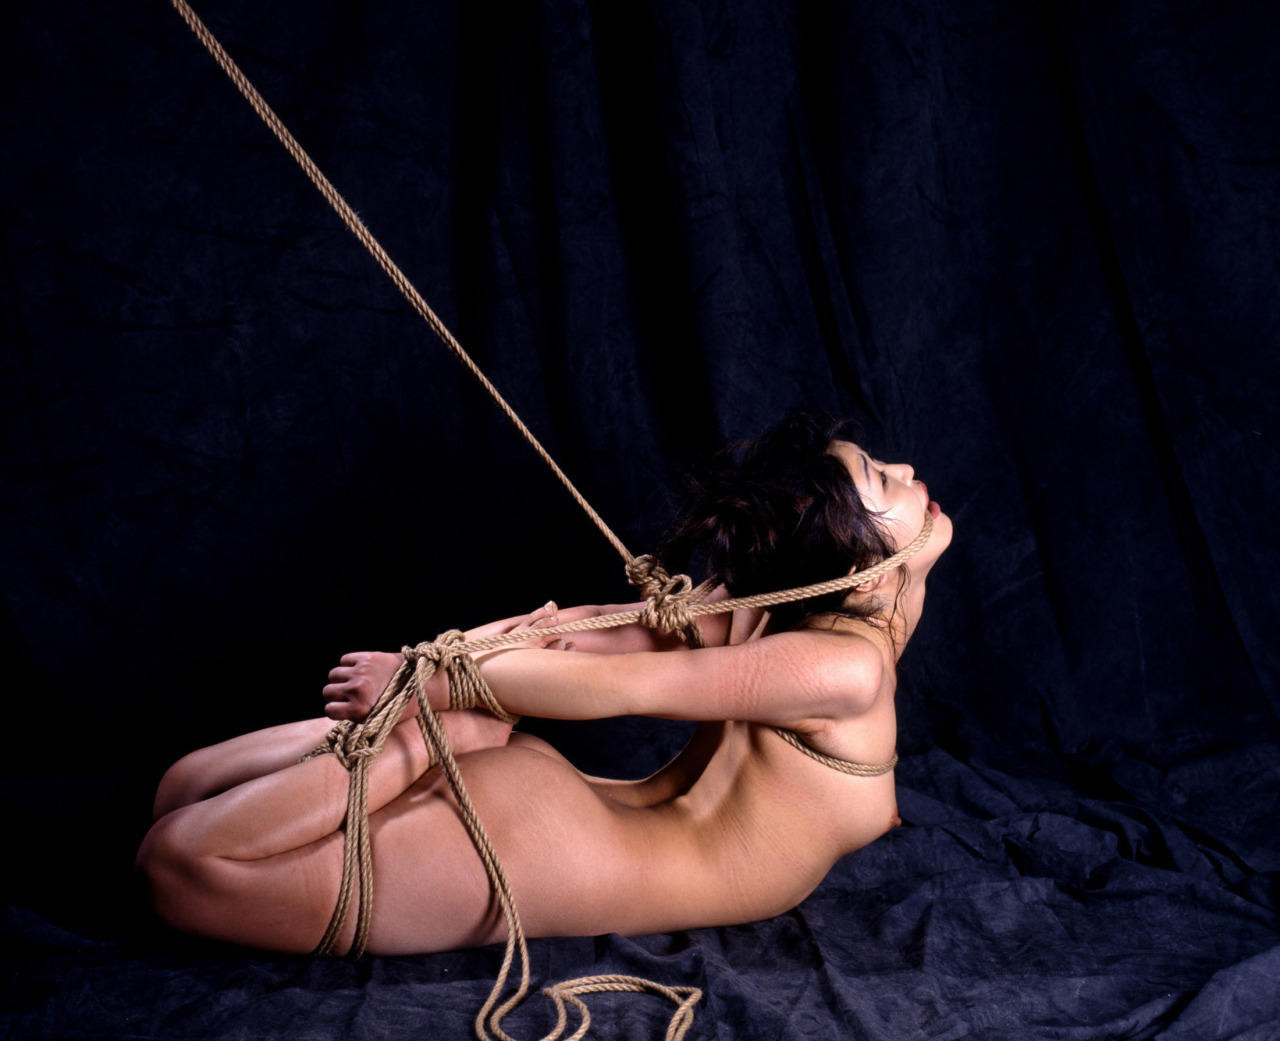 【SMエロ画像】ここから責めればより食い込んで…苦痛と快感の緊縛調教!